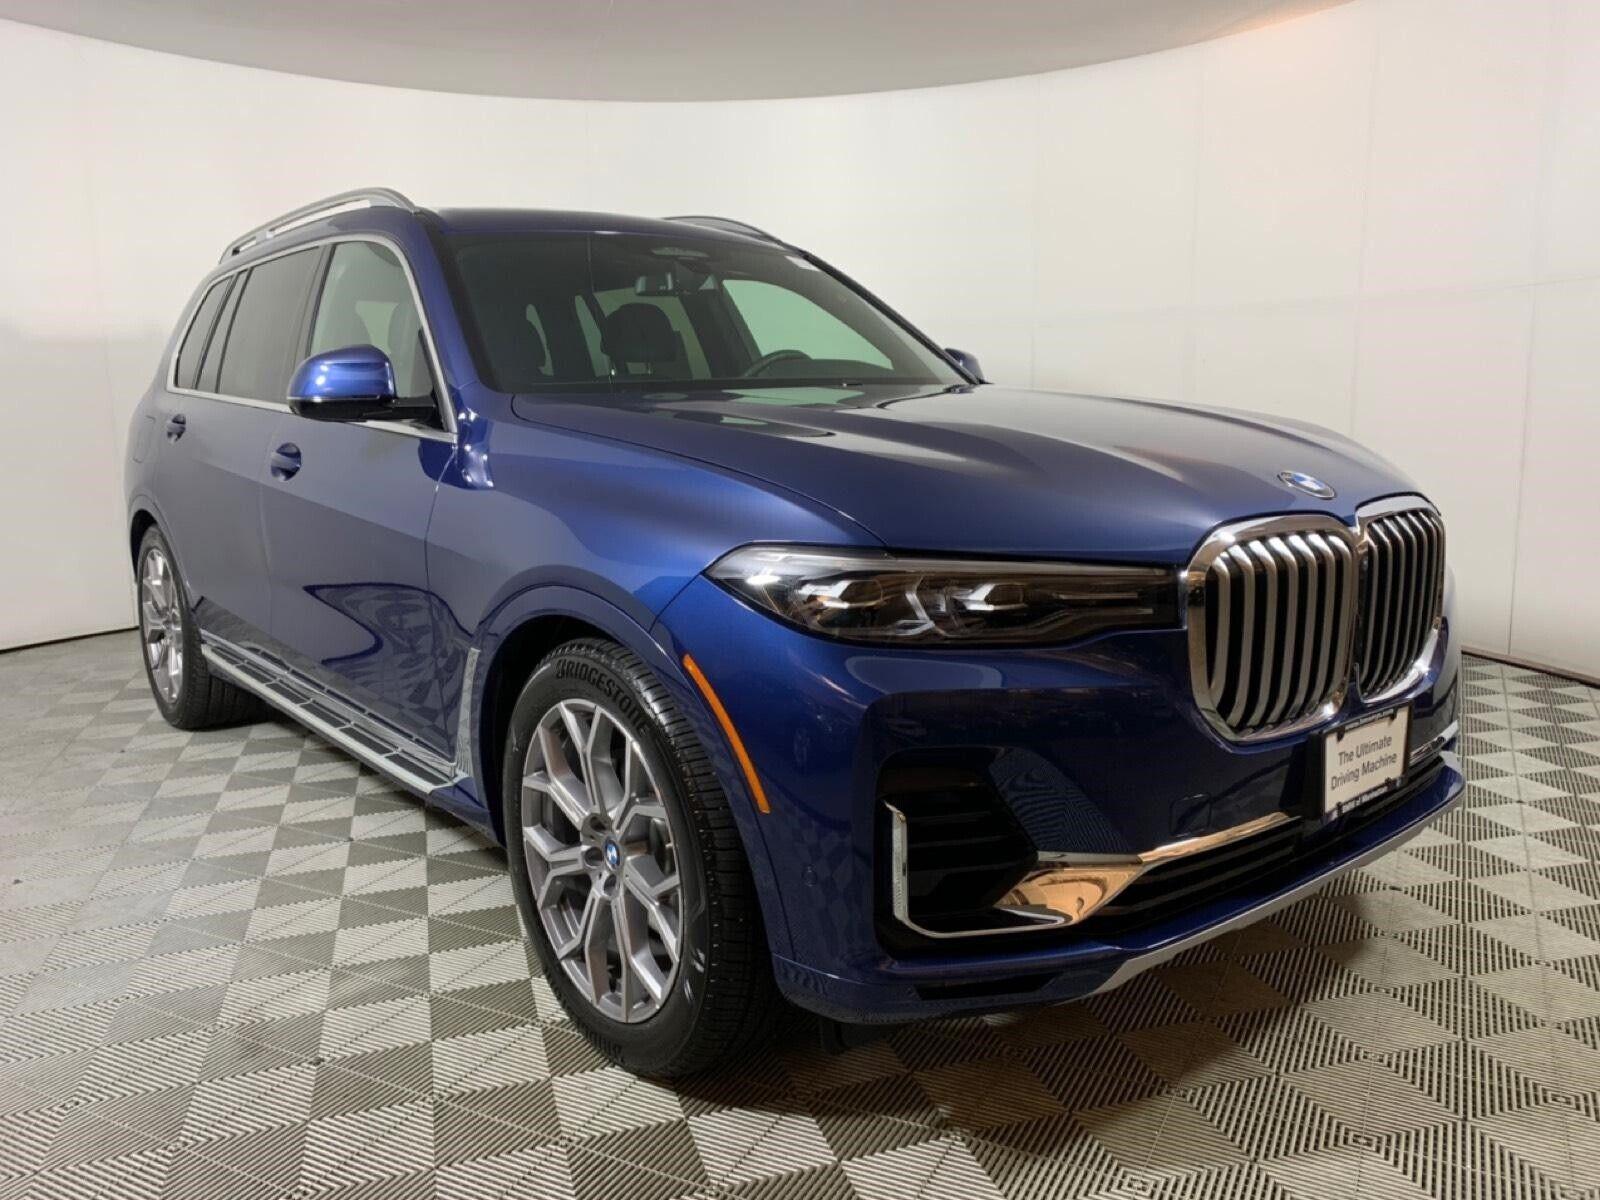 2020 BMW X7 xDrive40i xDrive40i AUTOMATIC, only 2682 Miles!!